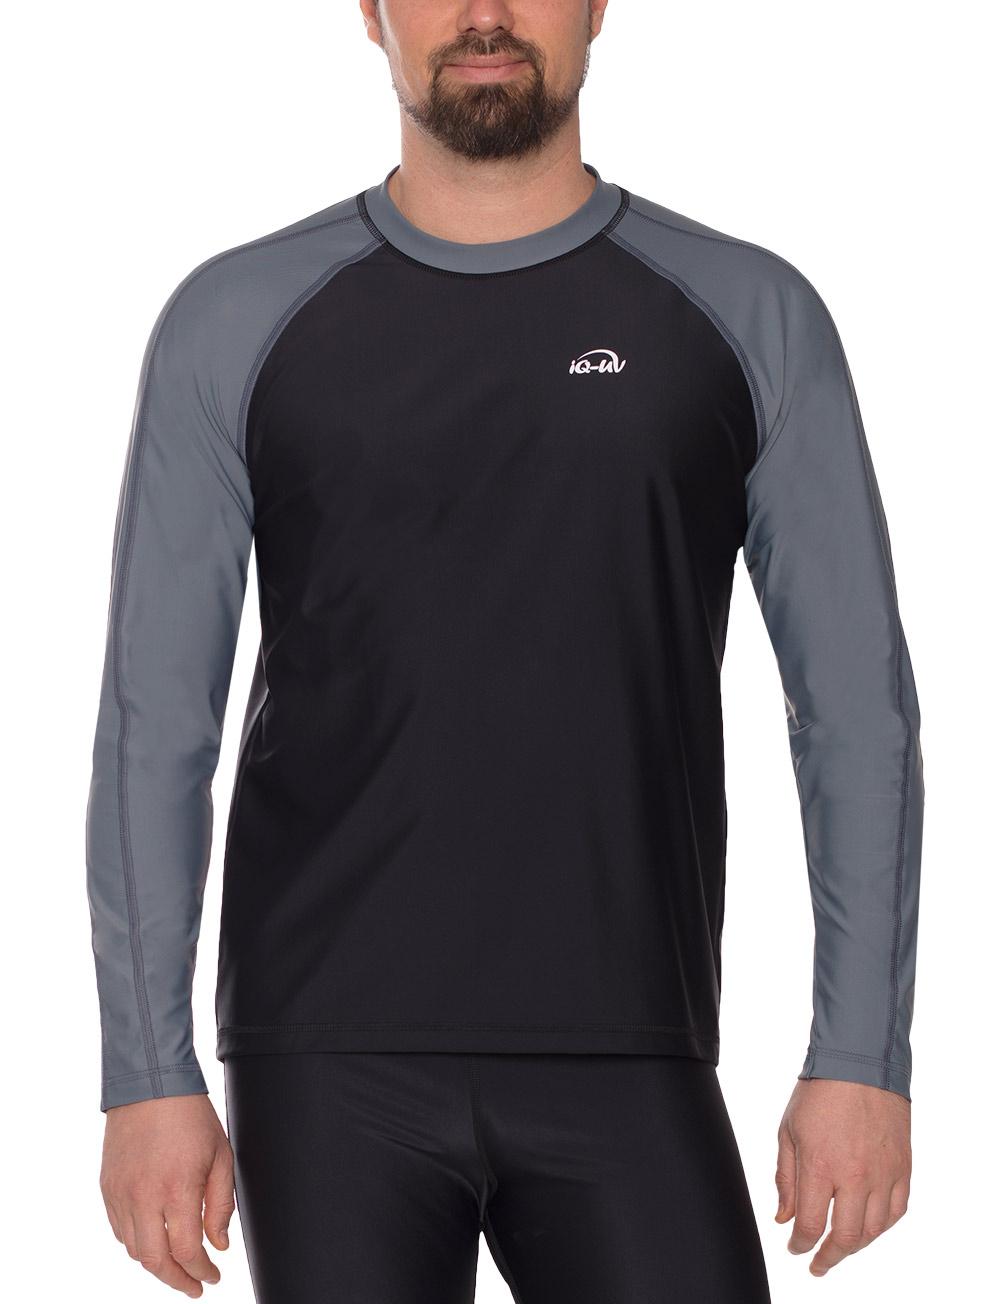 aa394f2e483cb6 ... Preview  UV T-Shirt Herren